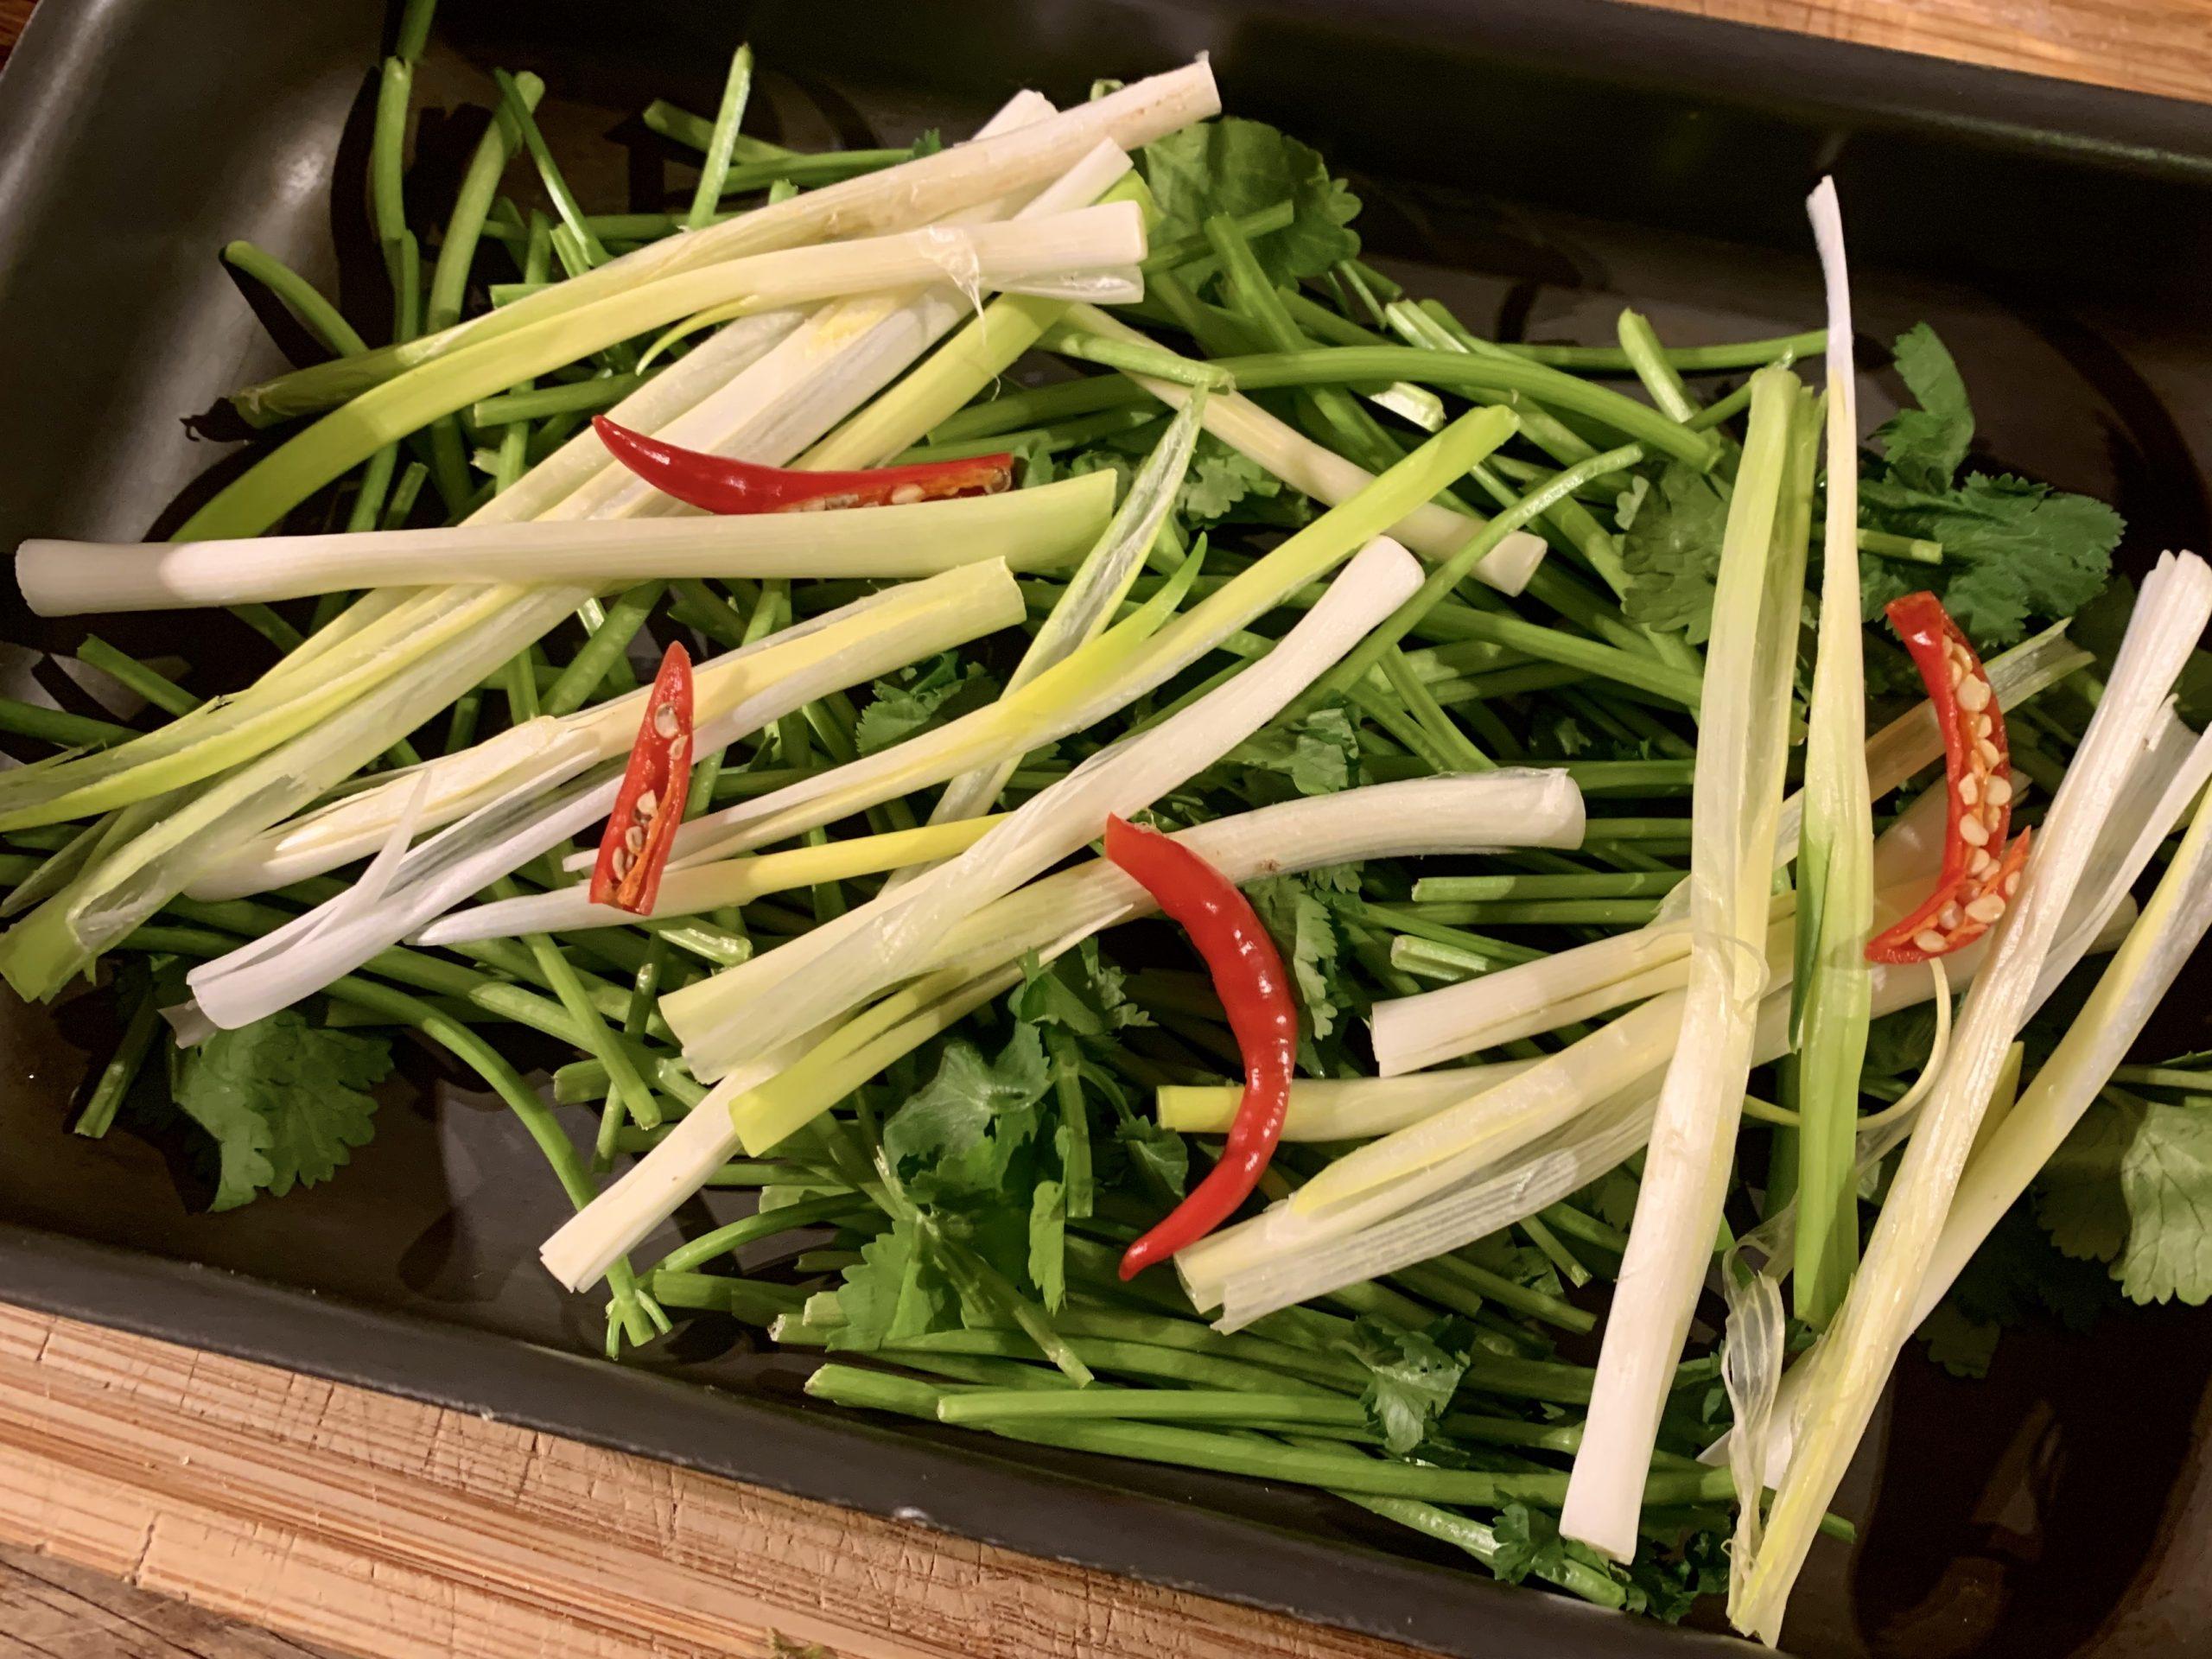 Onions, coriander, chillies